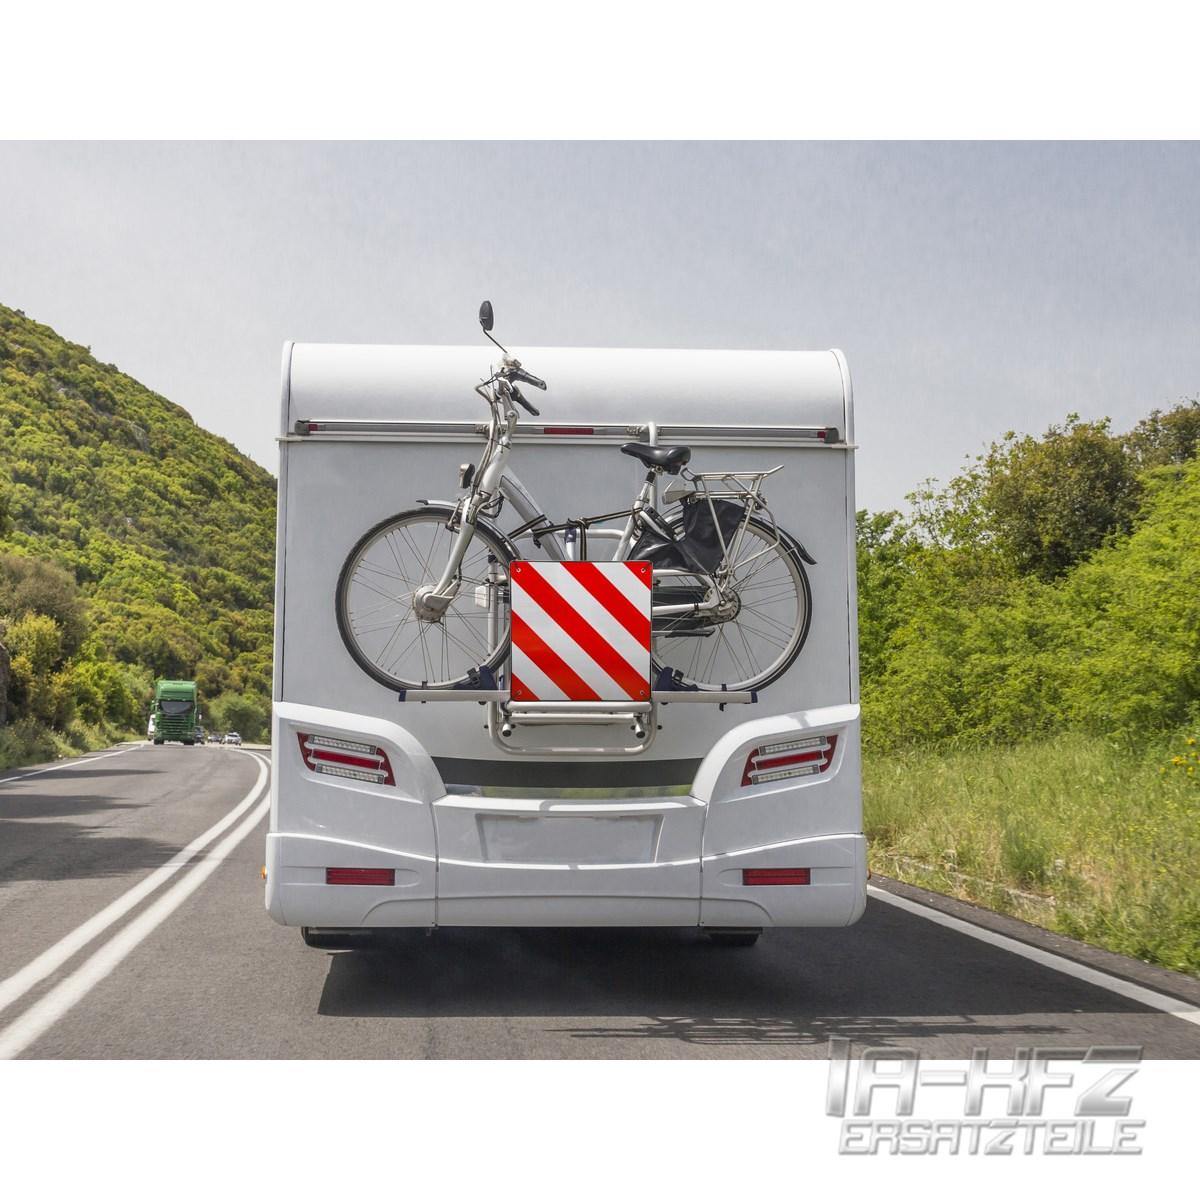 warntafeln warntafel italien spanien 50x50 cm f r wohnwagen hecktr ger fahrrad ebay. Black Bedroom Furniture Sets. Home Design Ideas